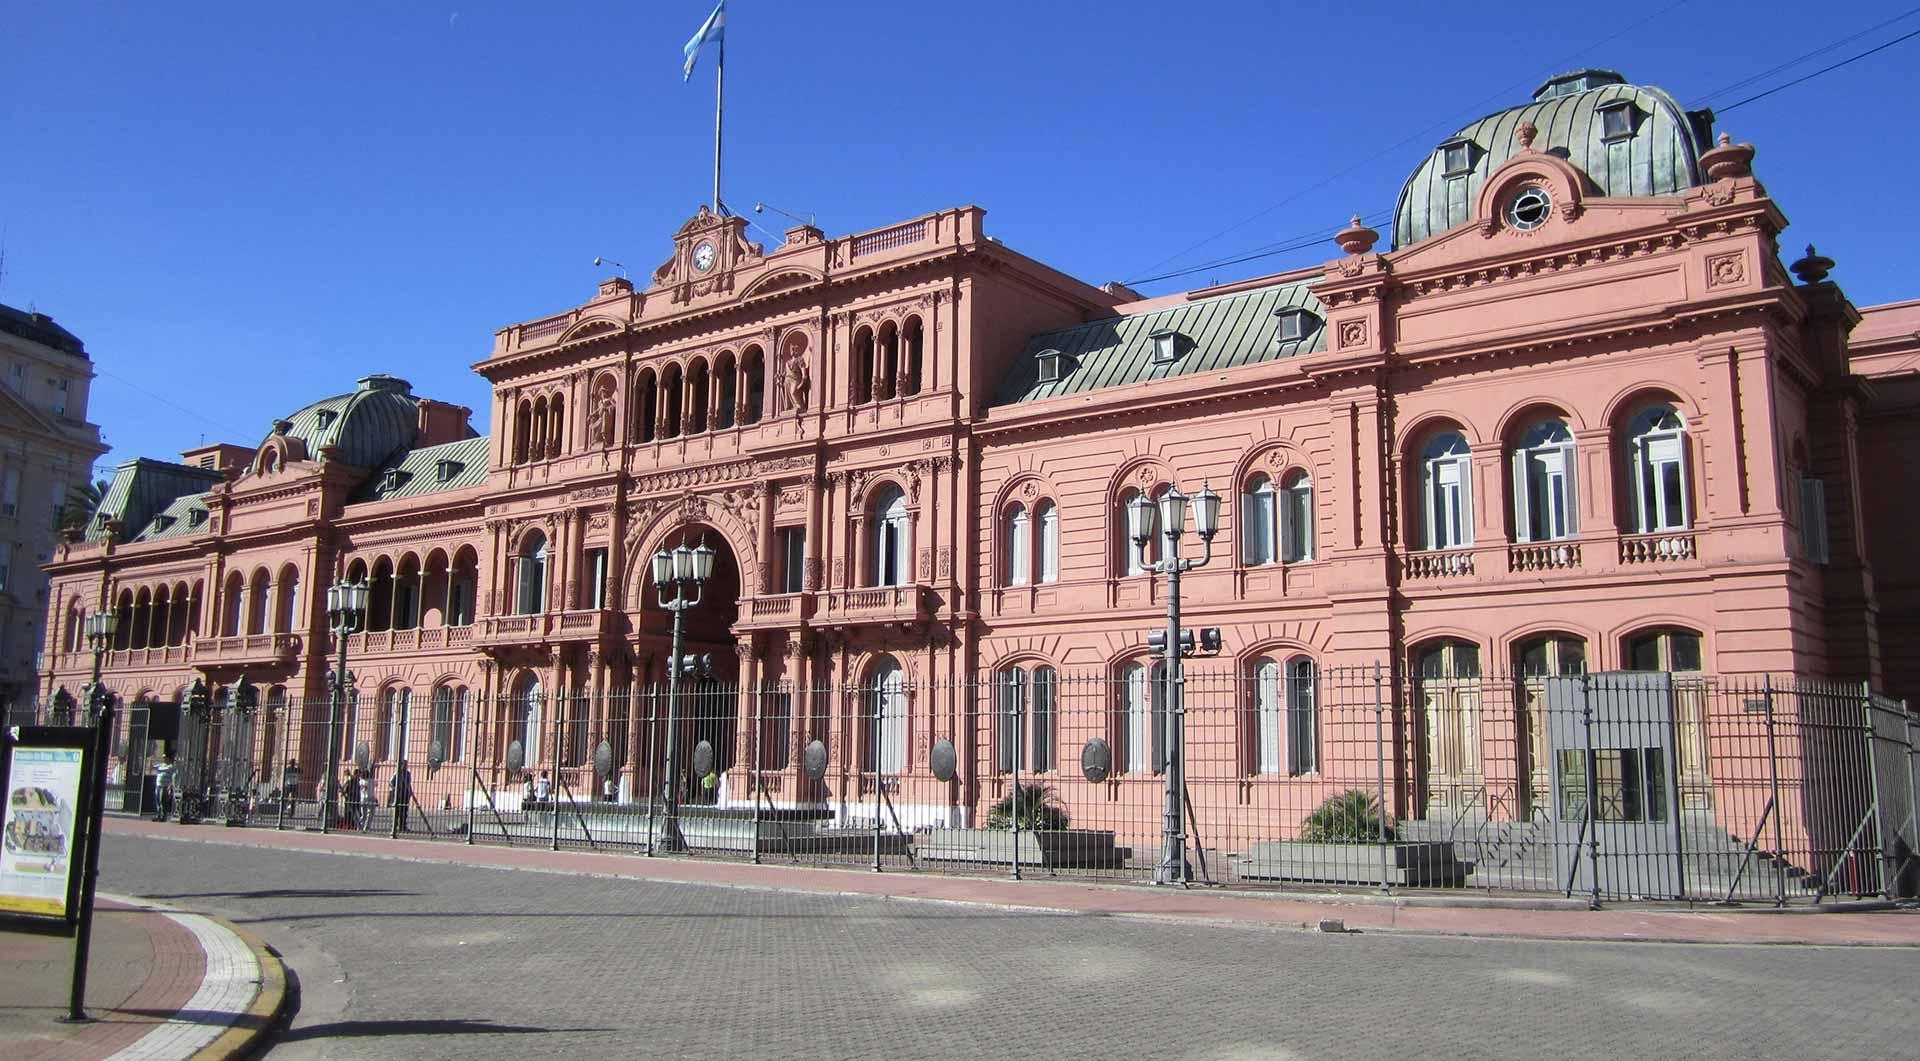 Un poco de historia de buenos aires la casa rosada for Casa argentina